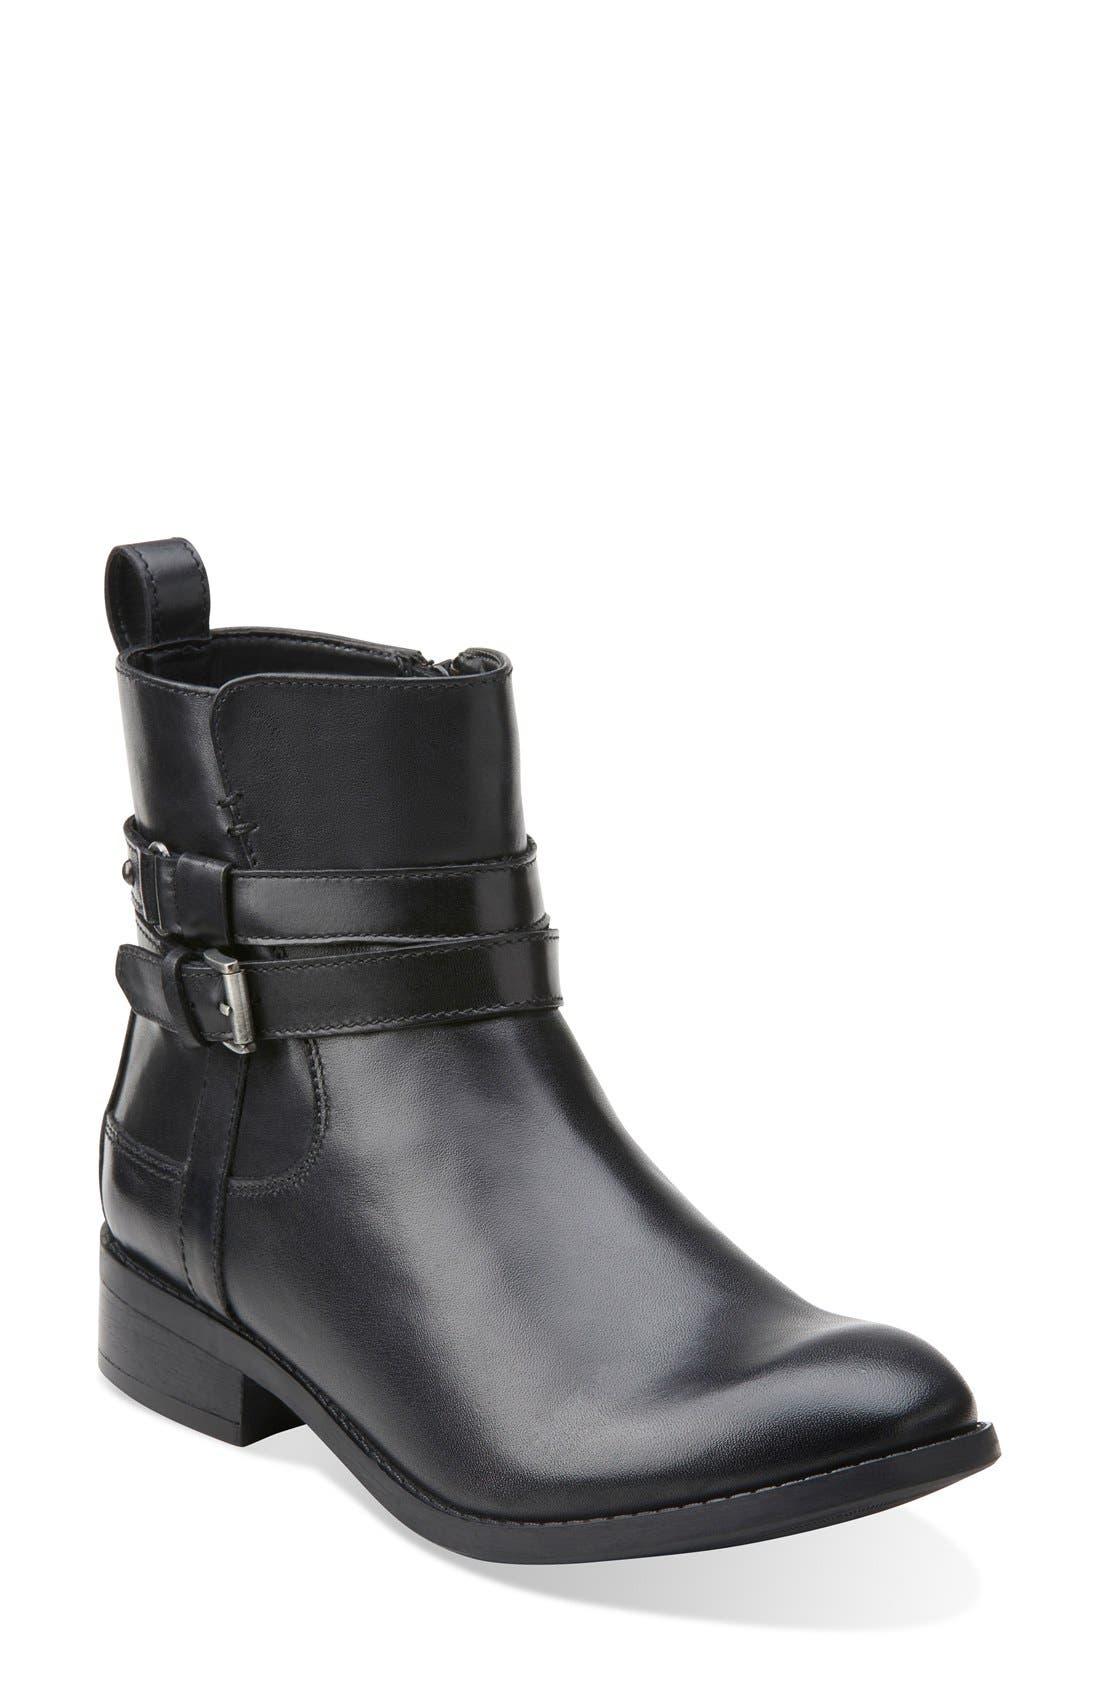 Main Image - Clarks® 'Pita Austin' WaterproofAnkle Boot (Women)